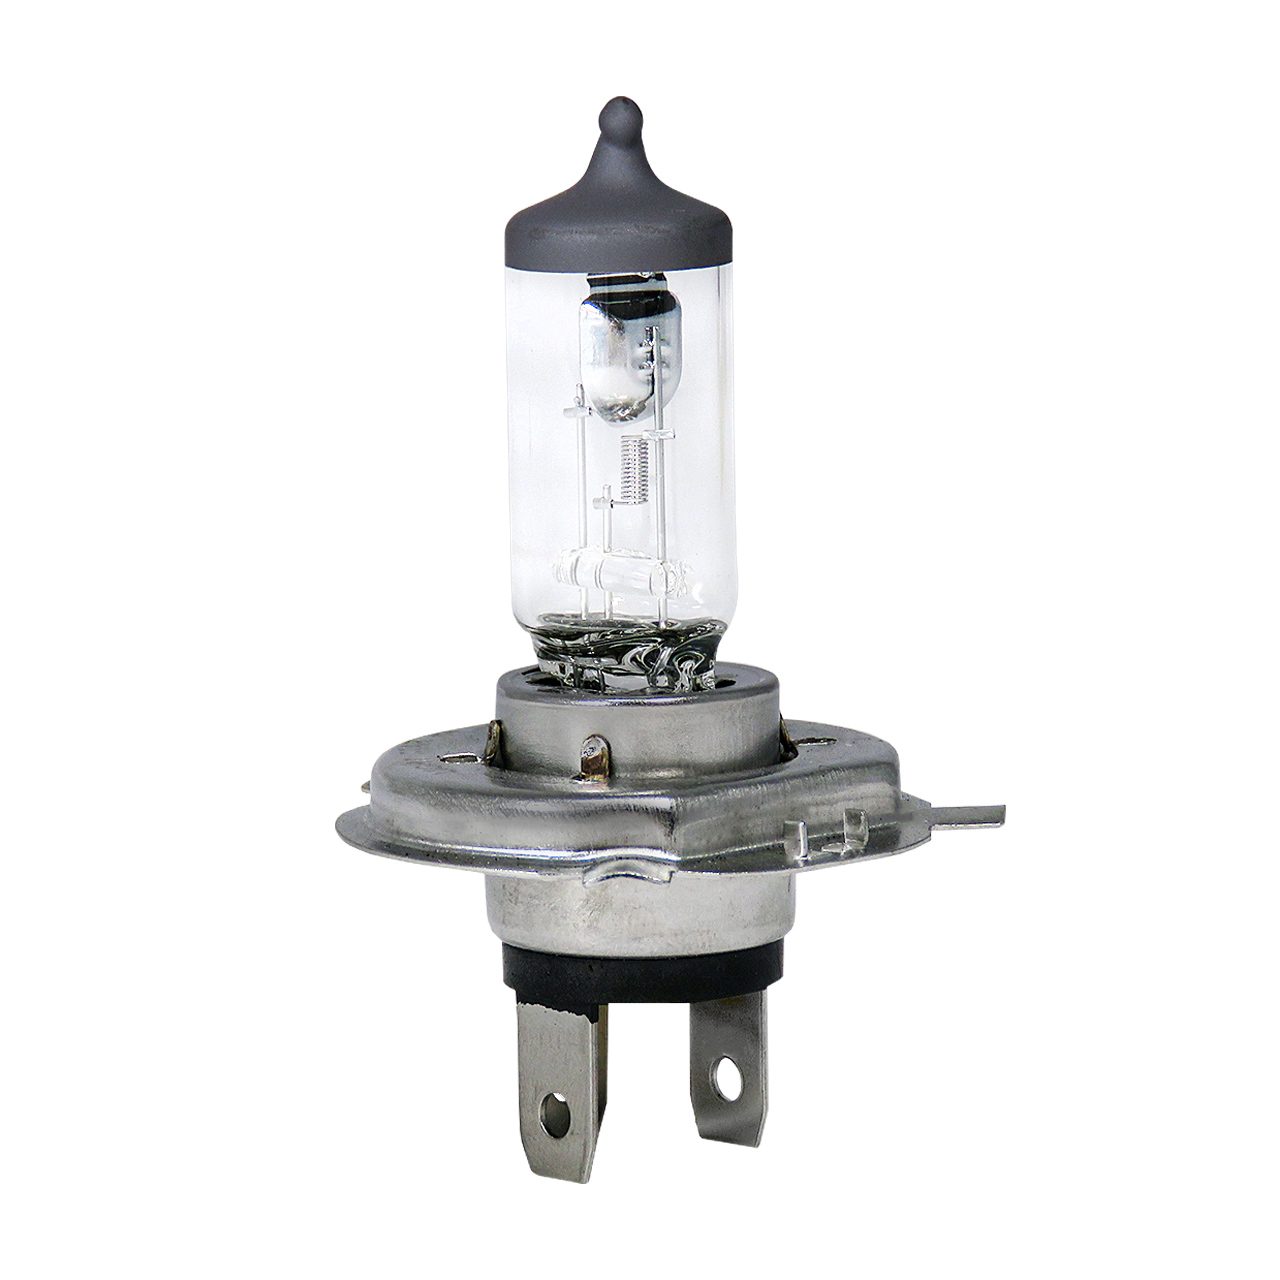 لامپ هالوژن خودرو لایت استار کد 2220702409